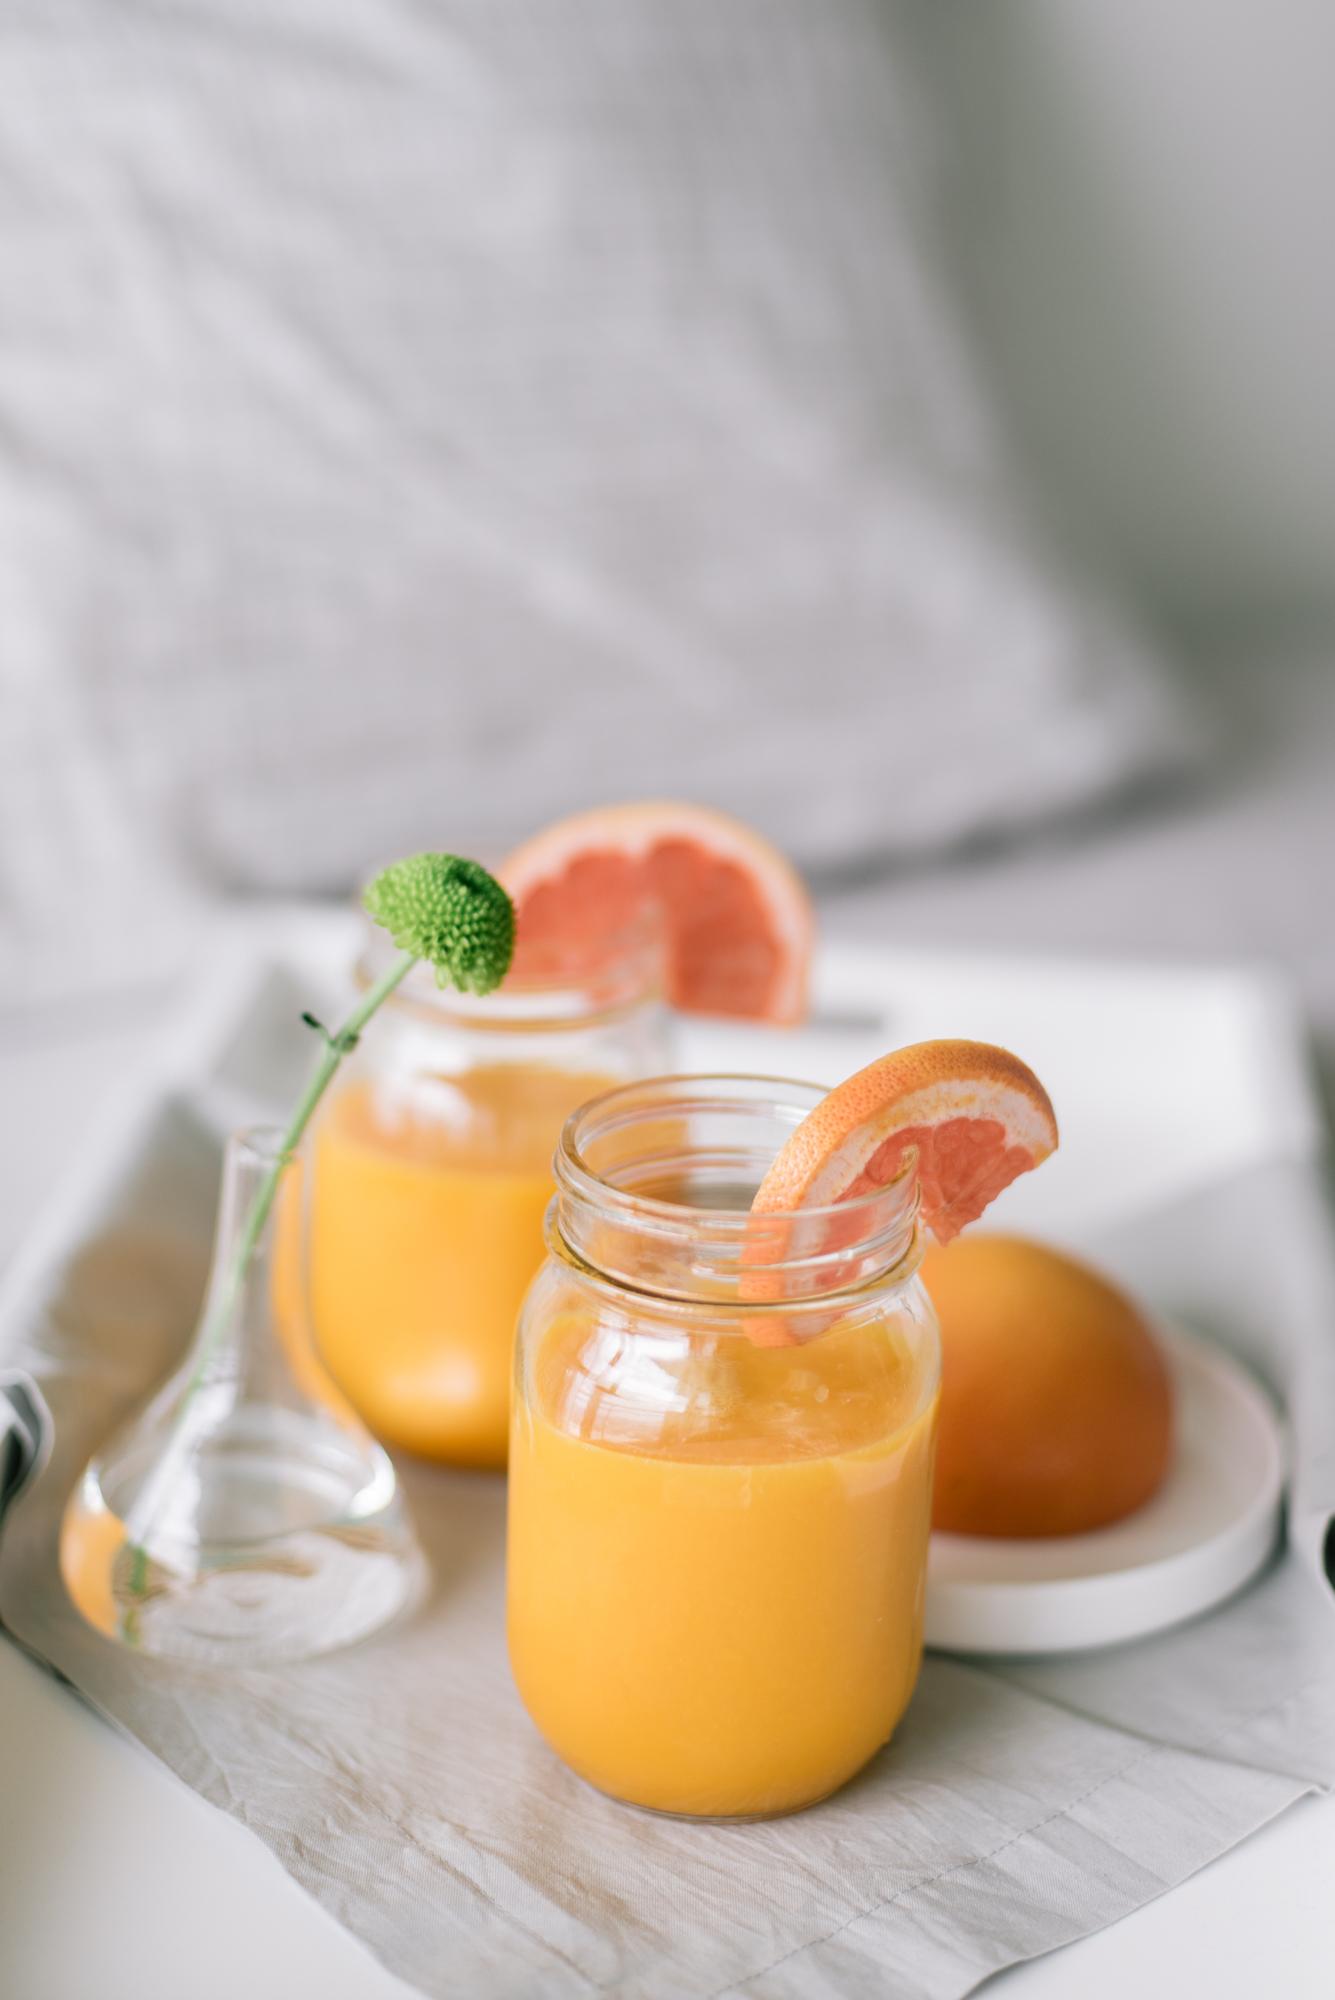 mango-smoothie-2.jpg